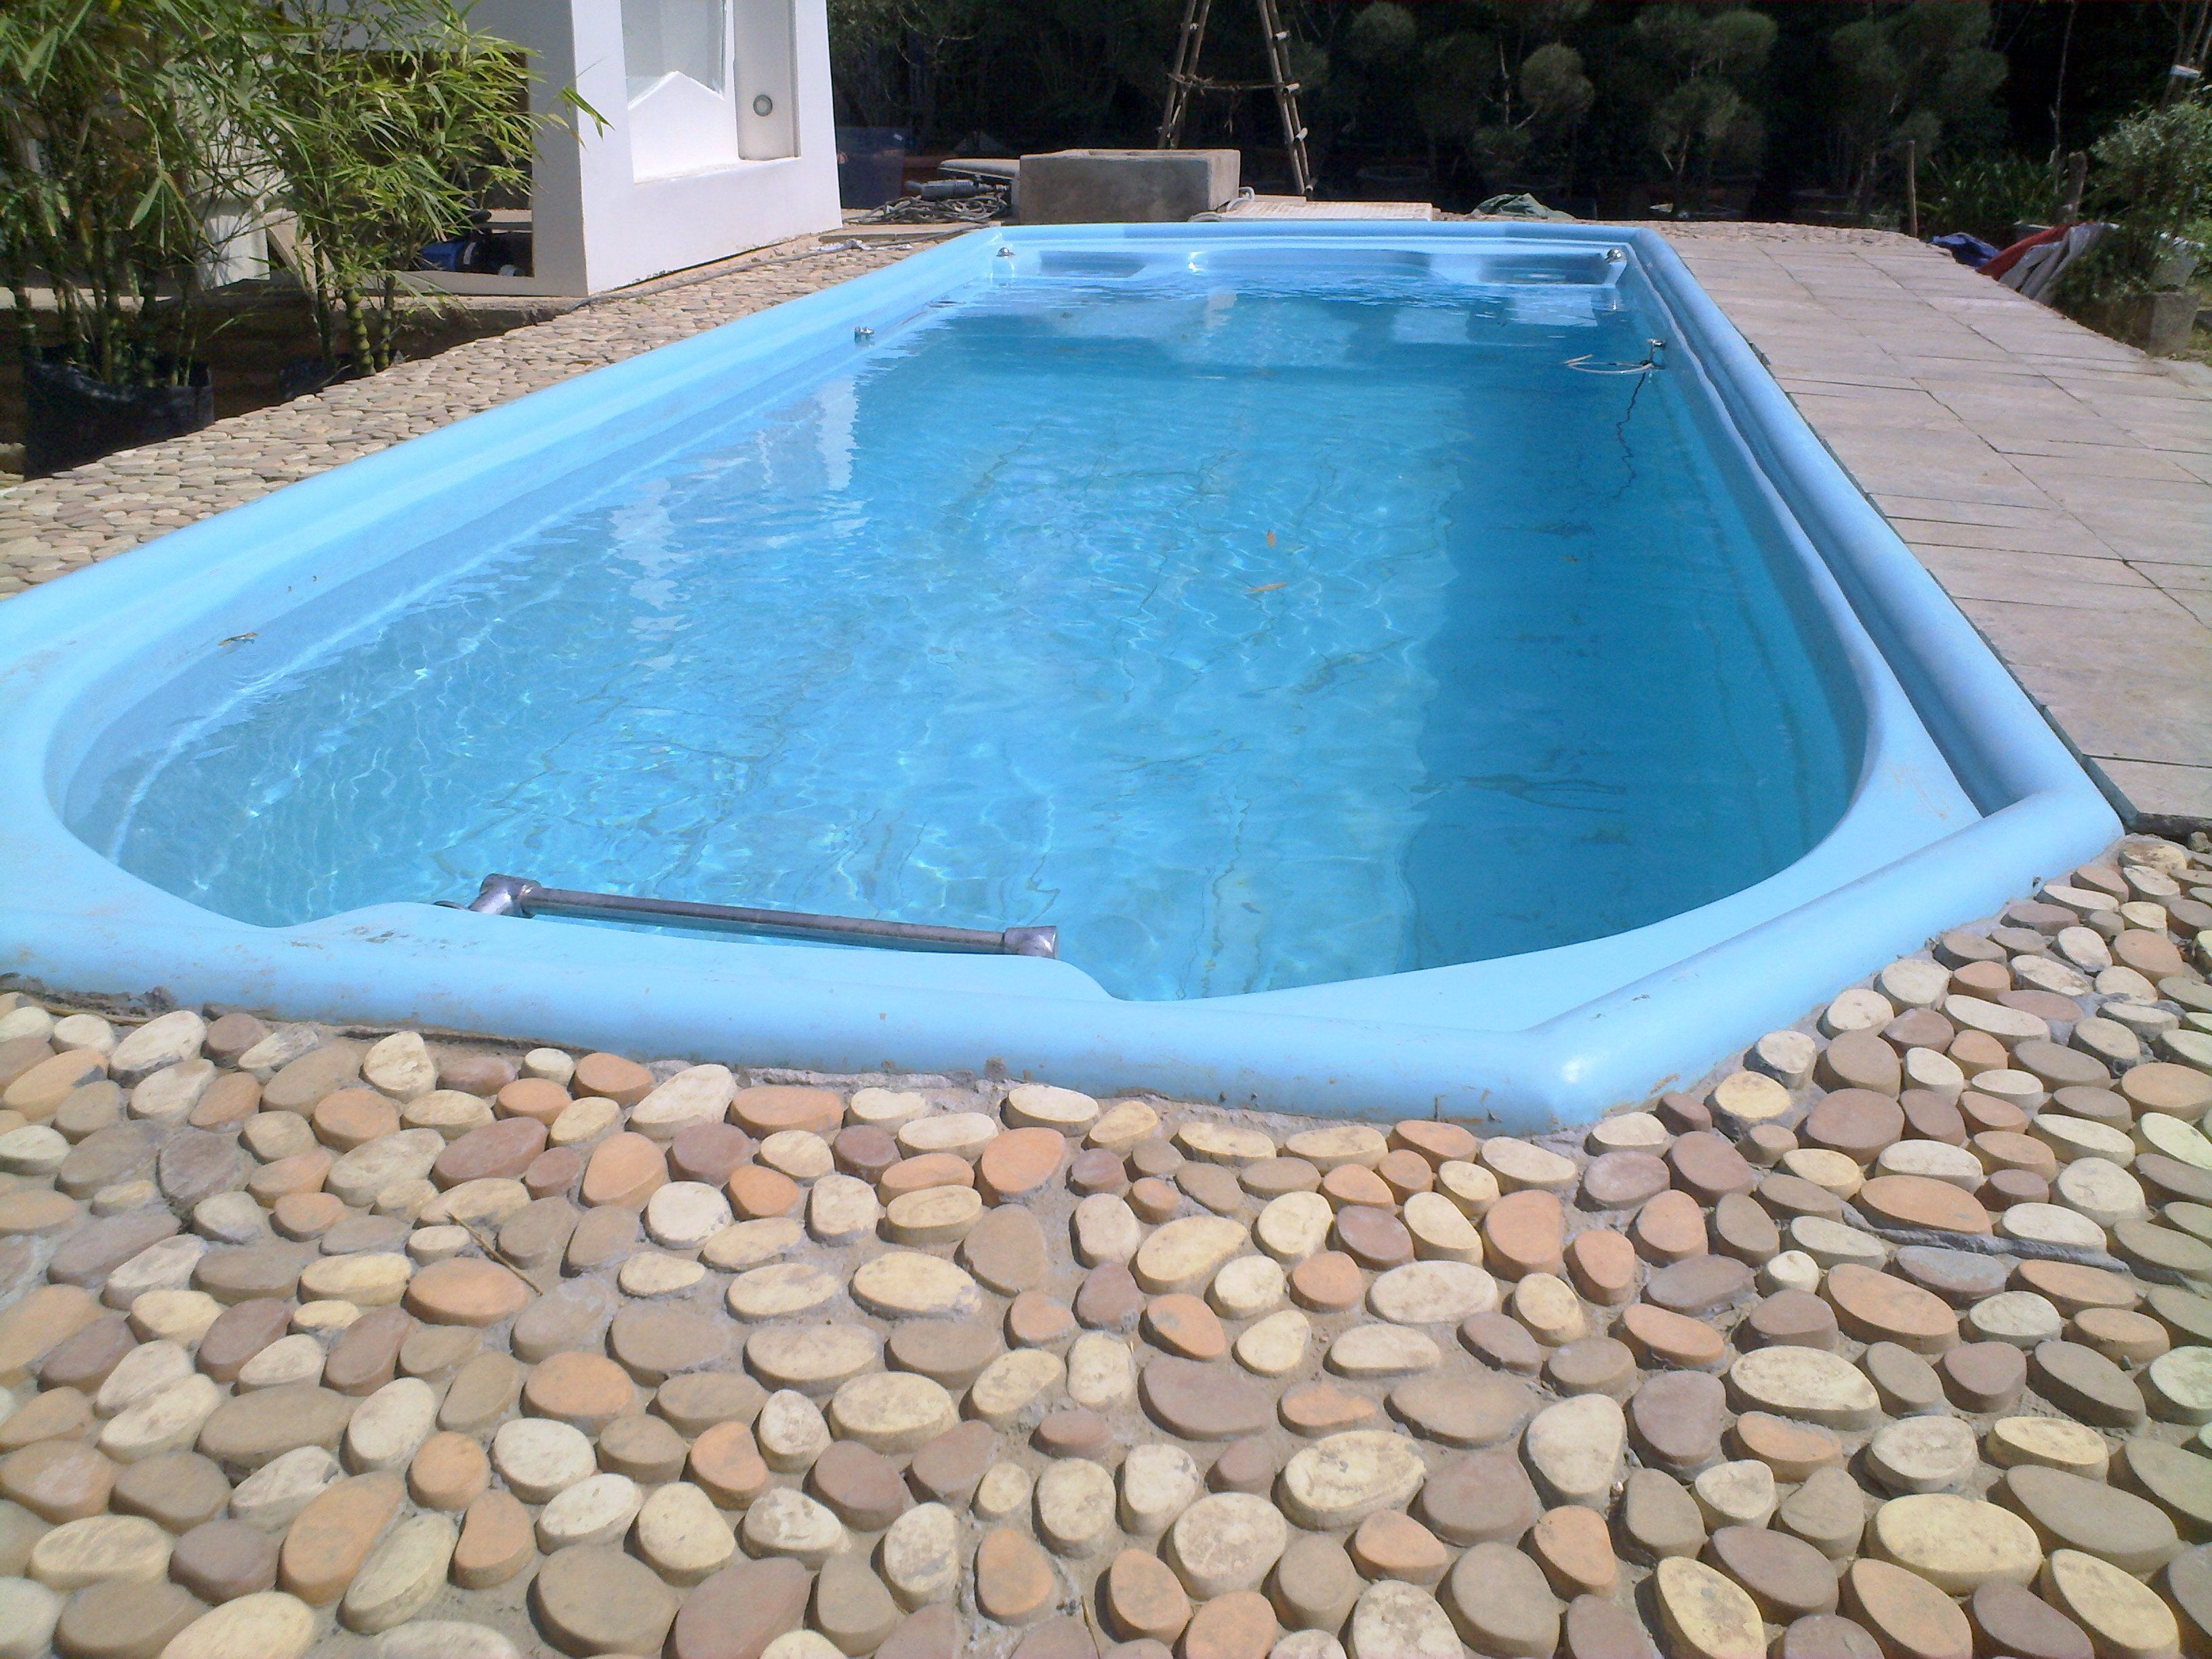 Prefabricated Swimming Pool   Swimming pools, Prefabricated ...